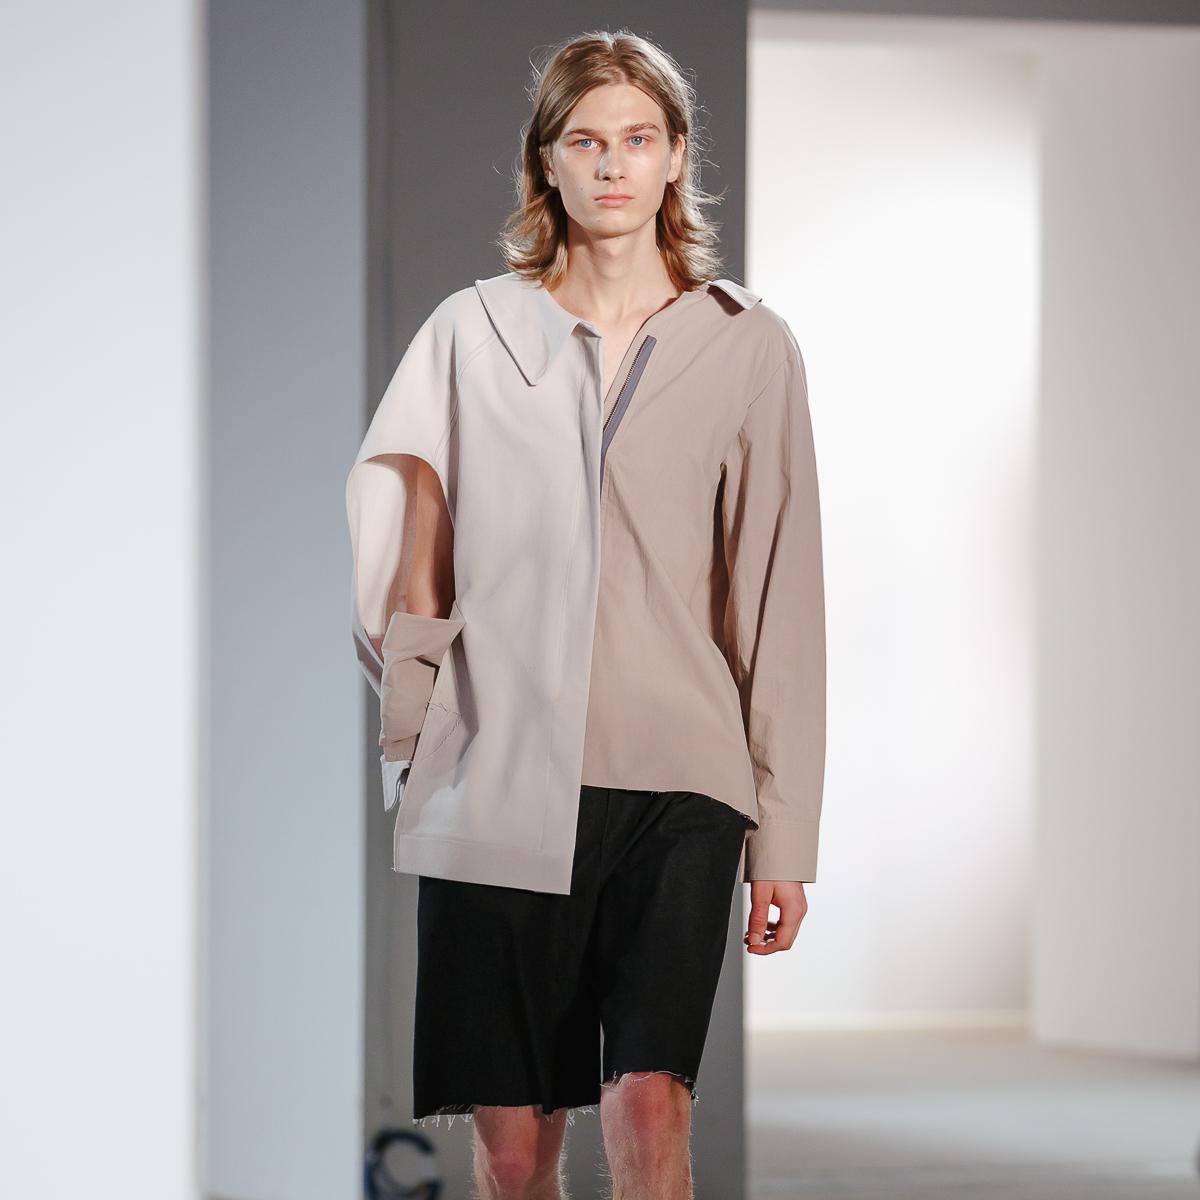 Vladimir Karaleev Show Fashion Week Berlin 2017-2